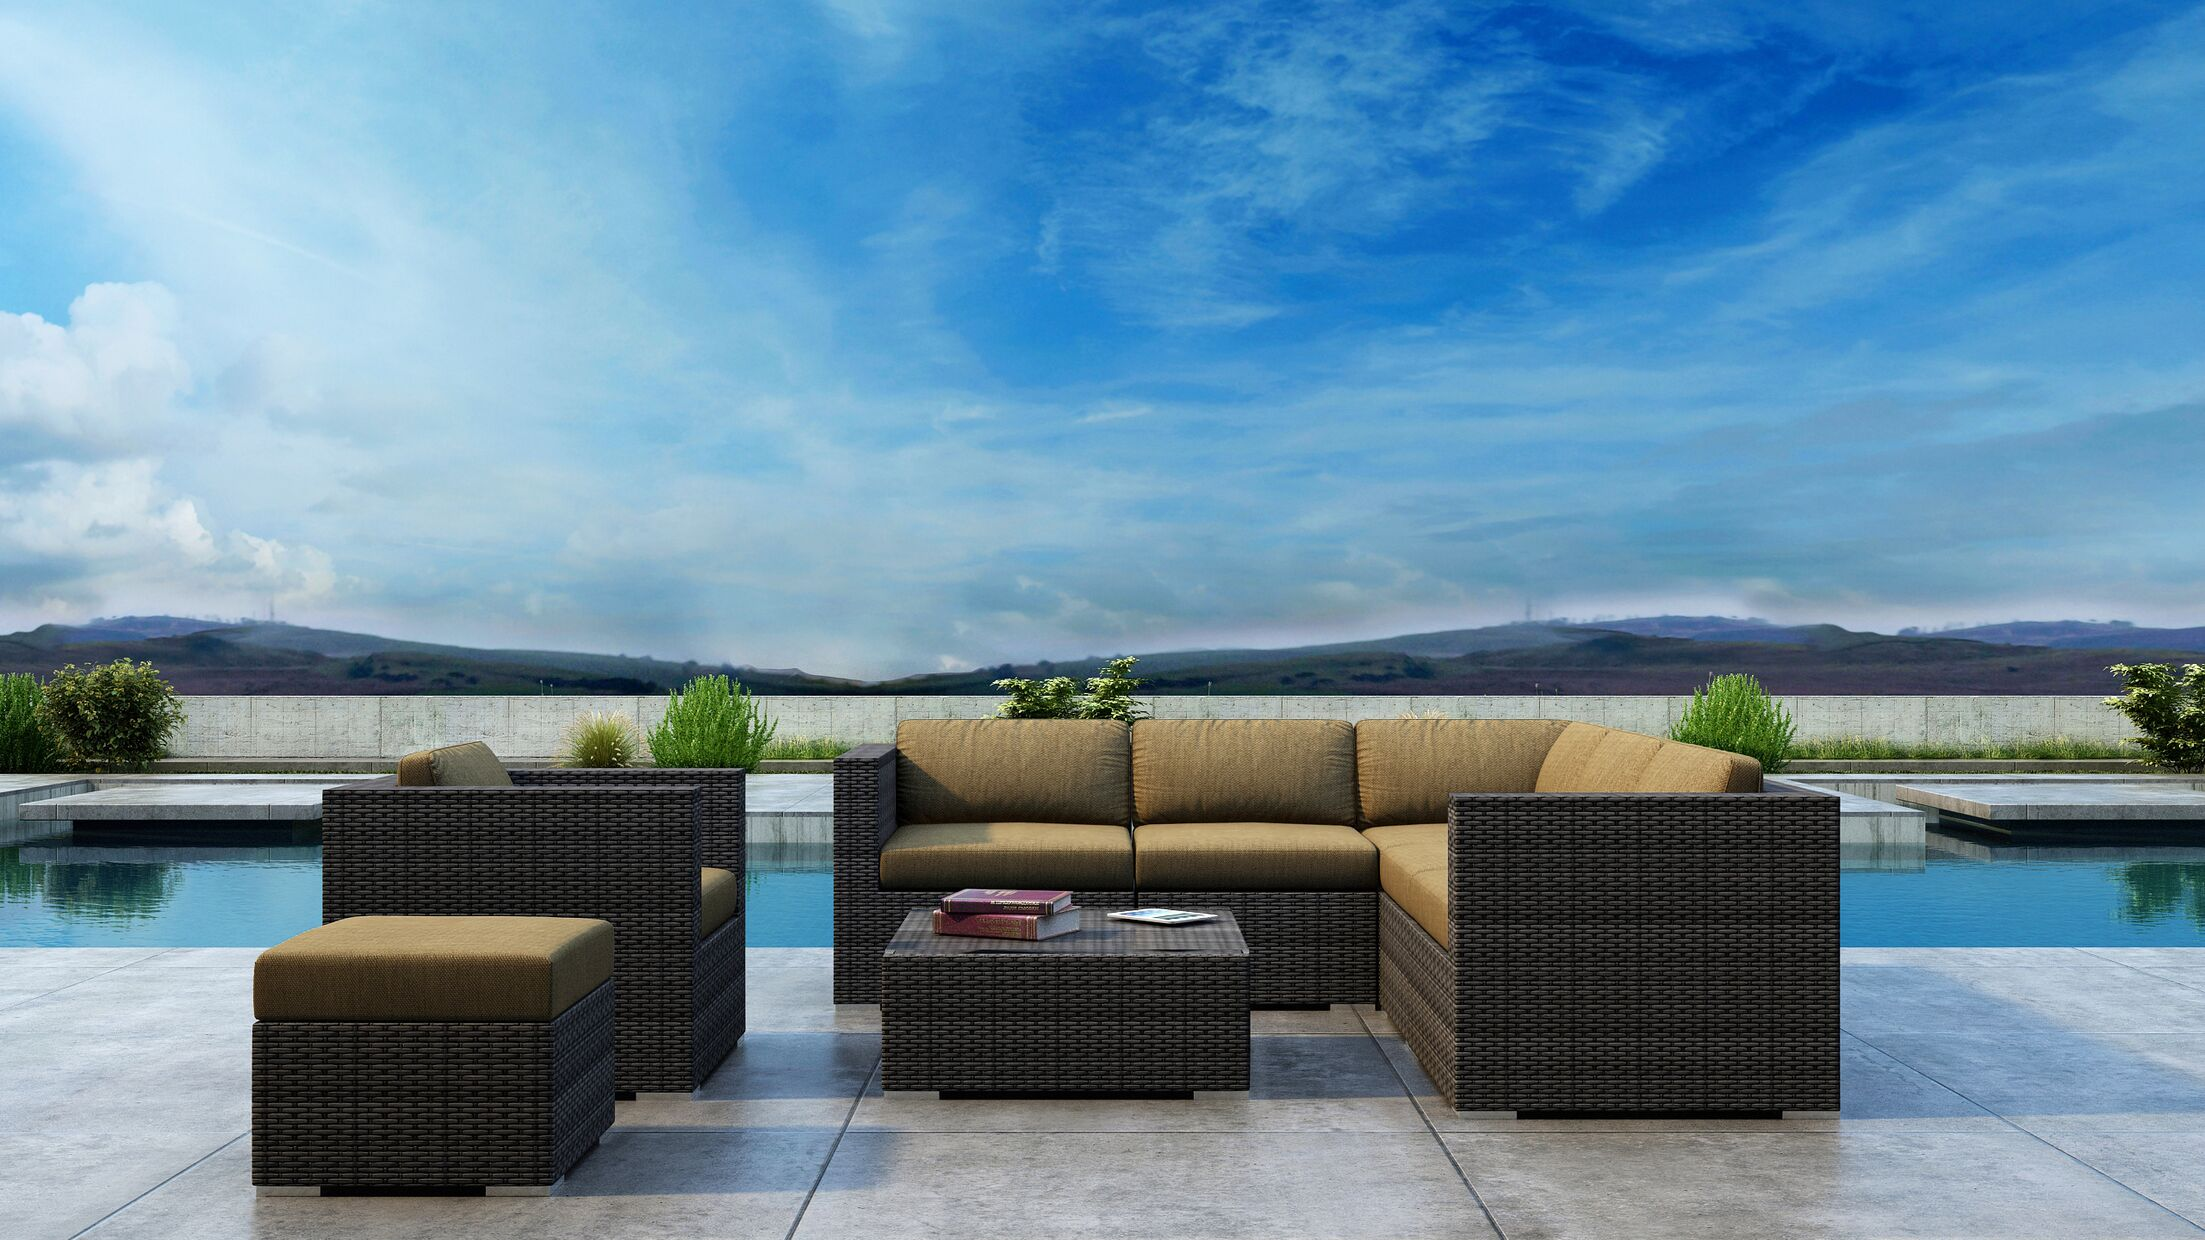 Gilleland 8 Piece Sectional Set with Sunbrella Cushion Cushion Color: Heather Beige